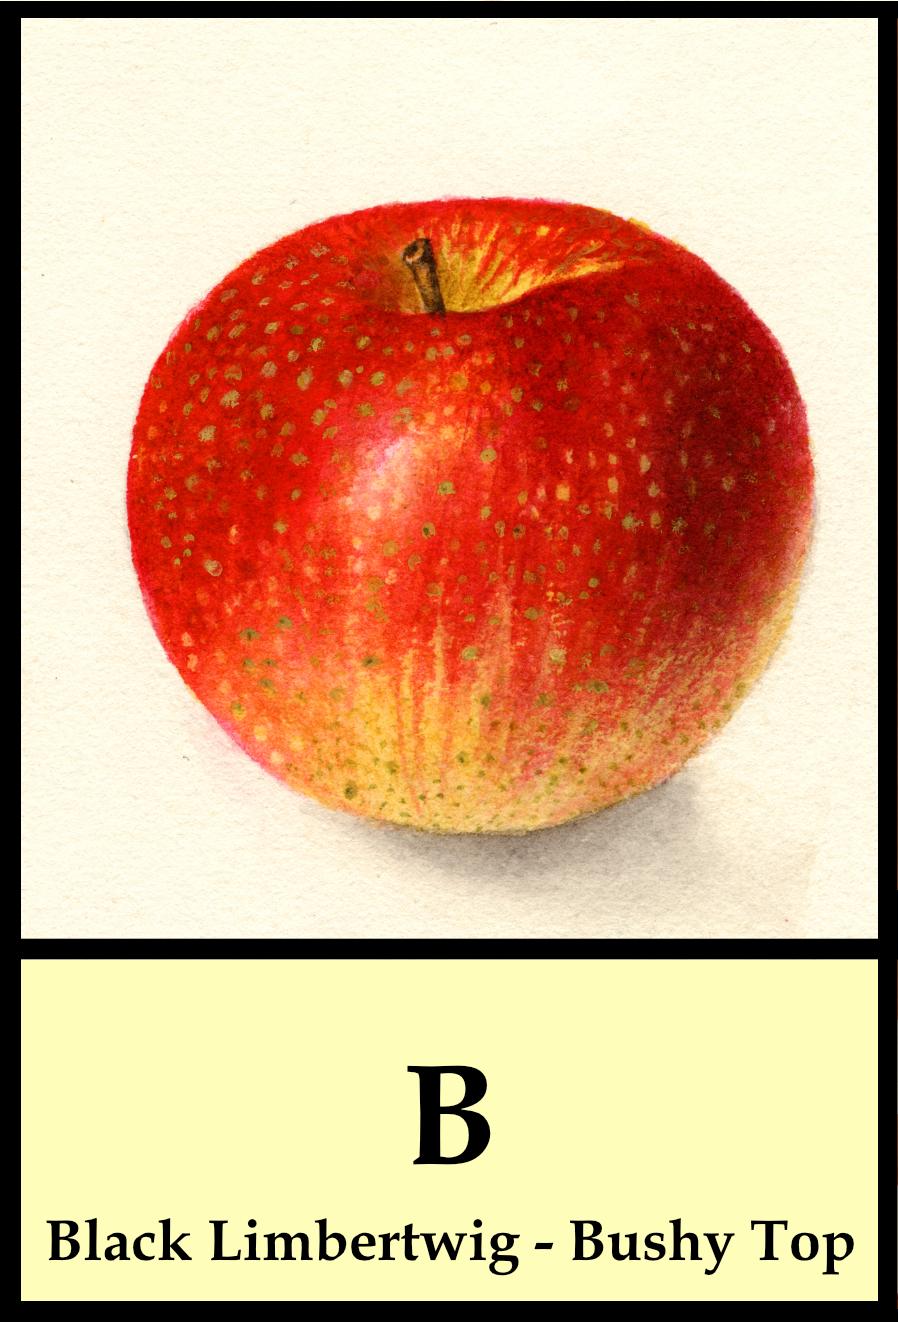 B apples - Black Limbertwig to Bushy Top